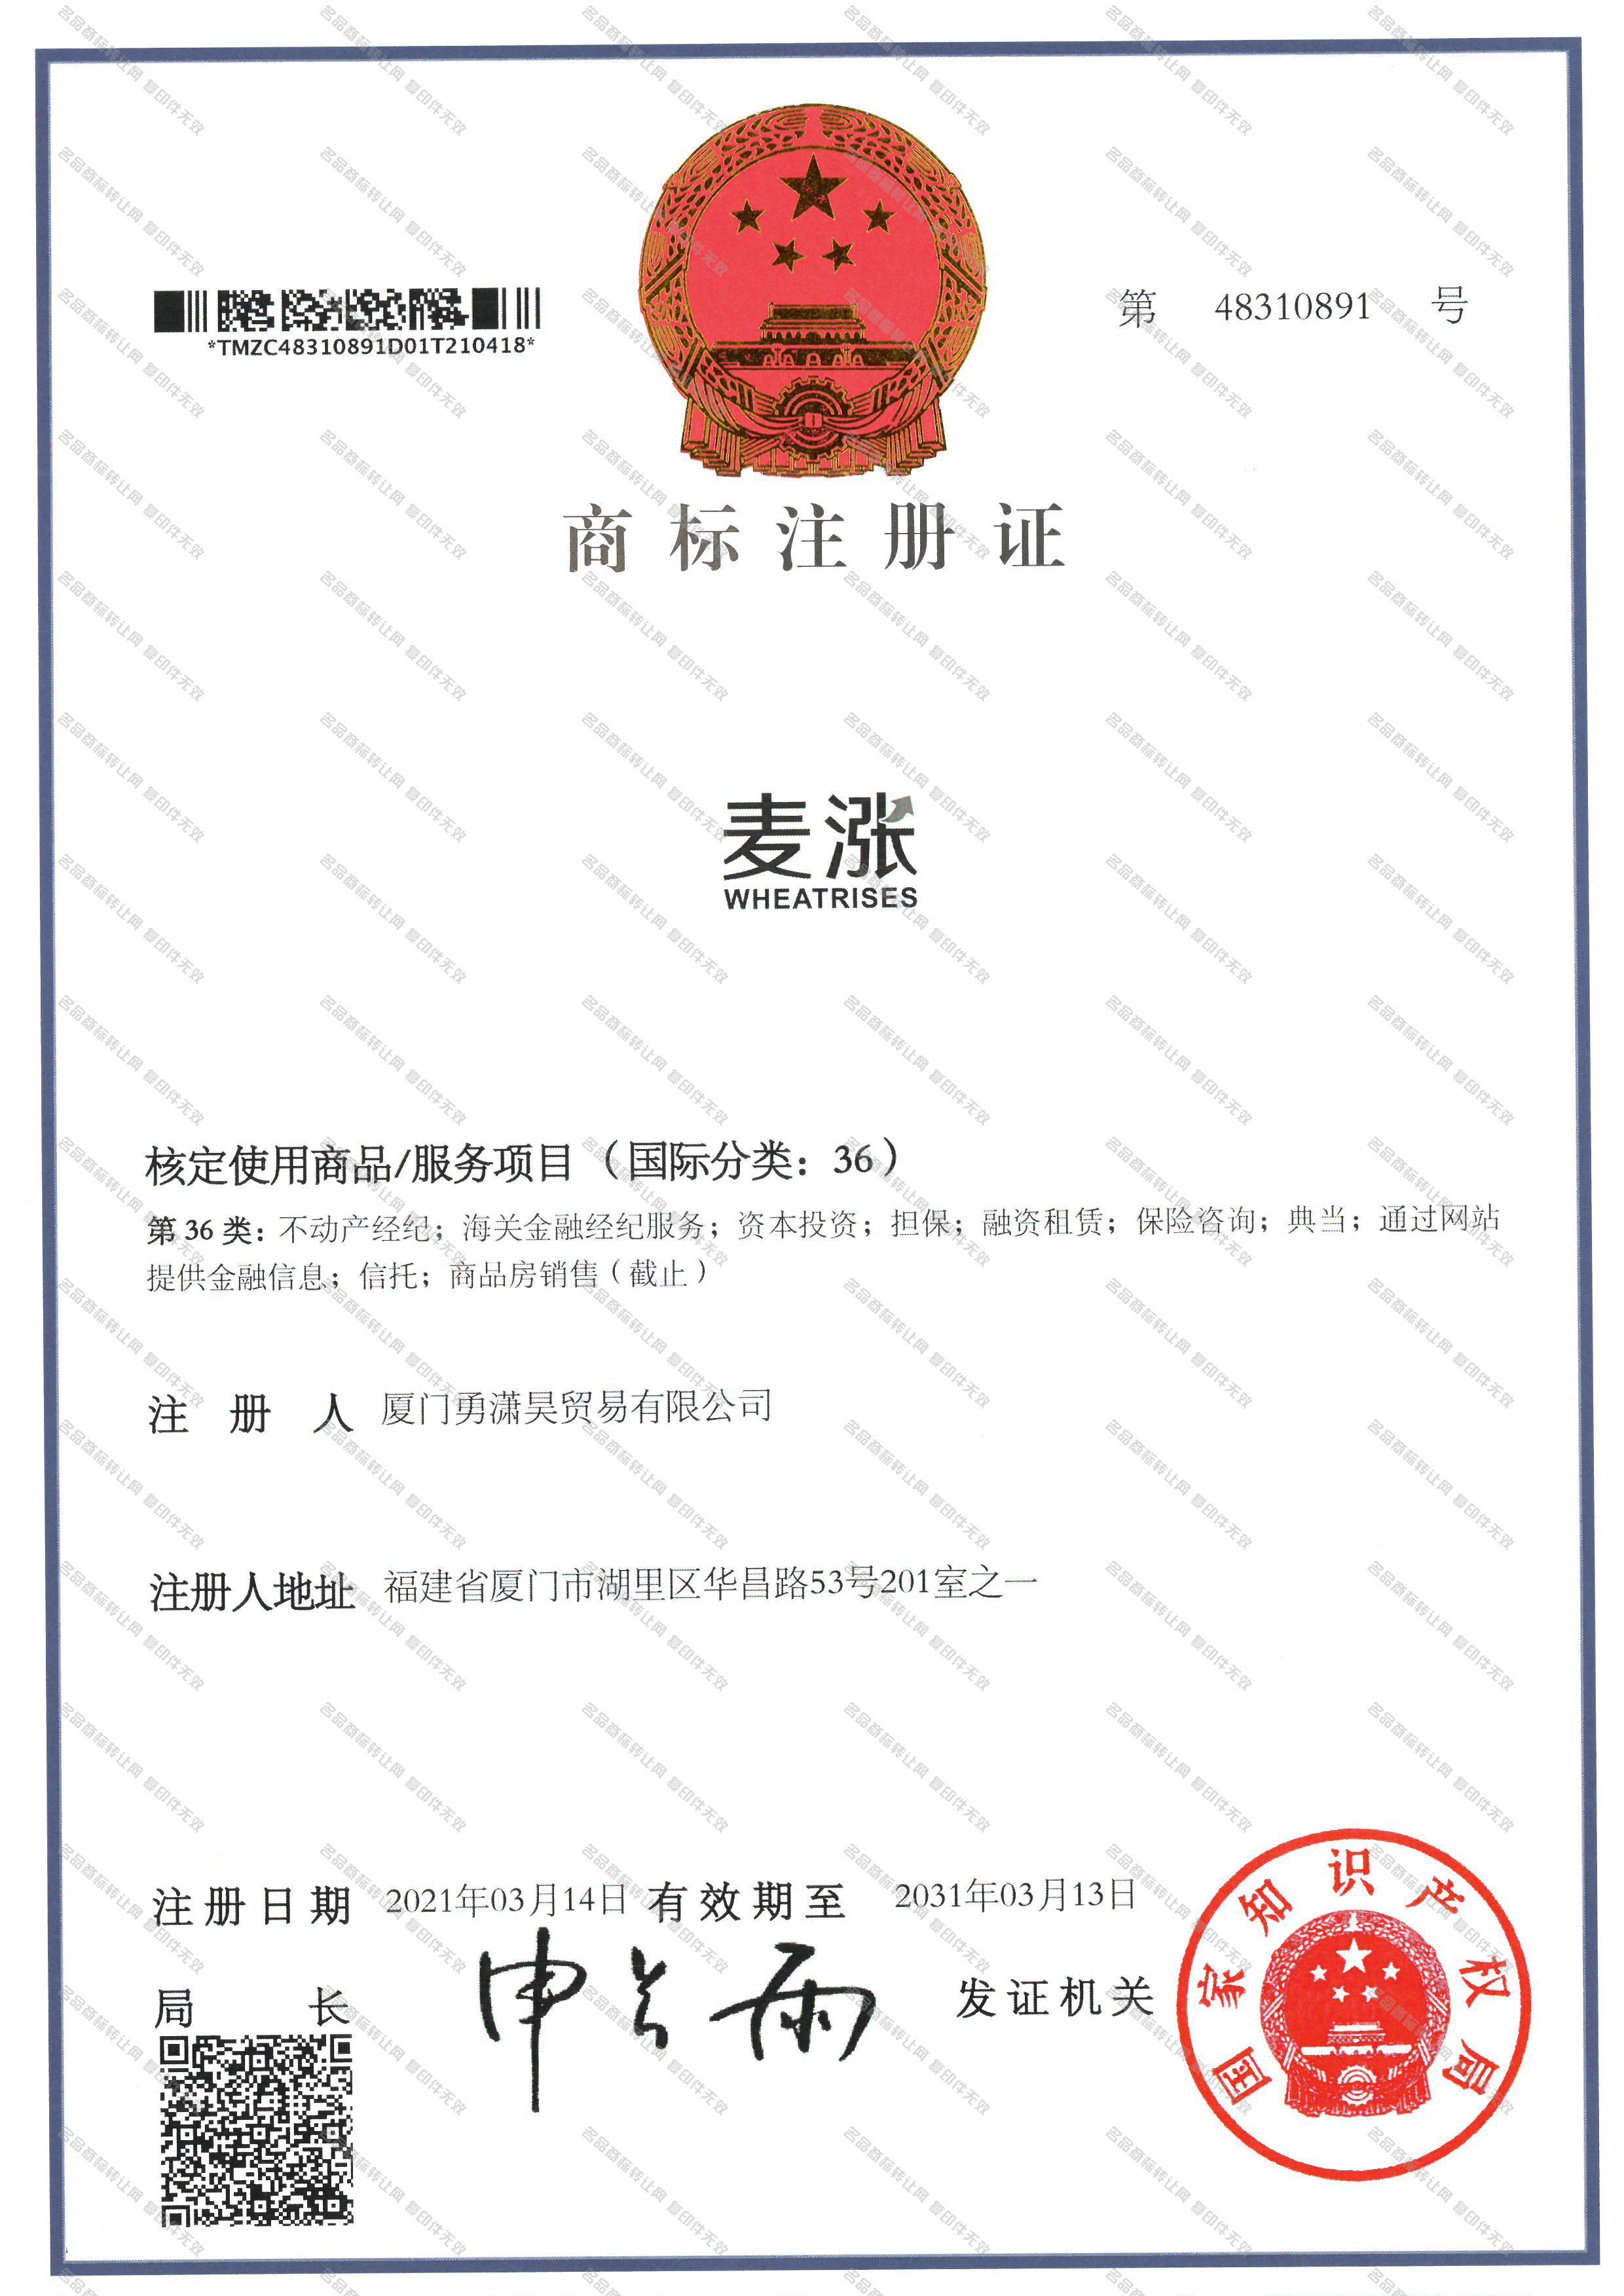 麦涨 WHEATRISES注册证